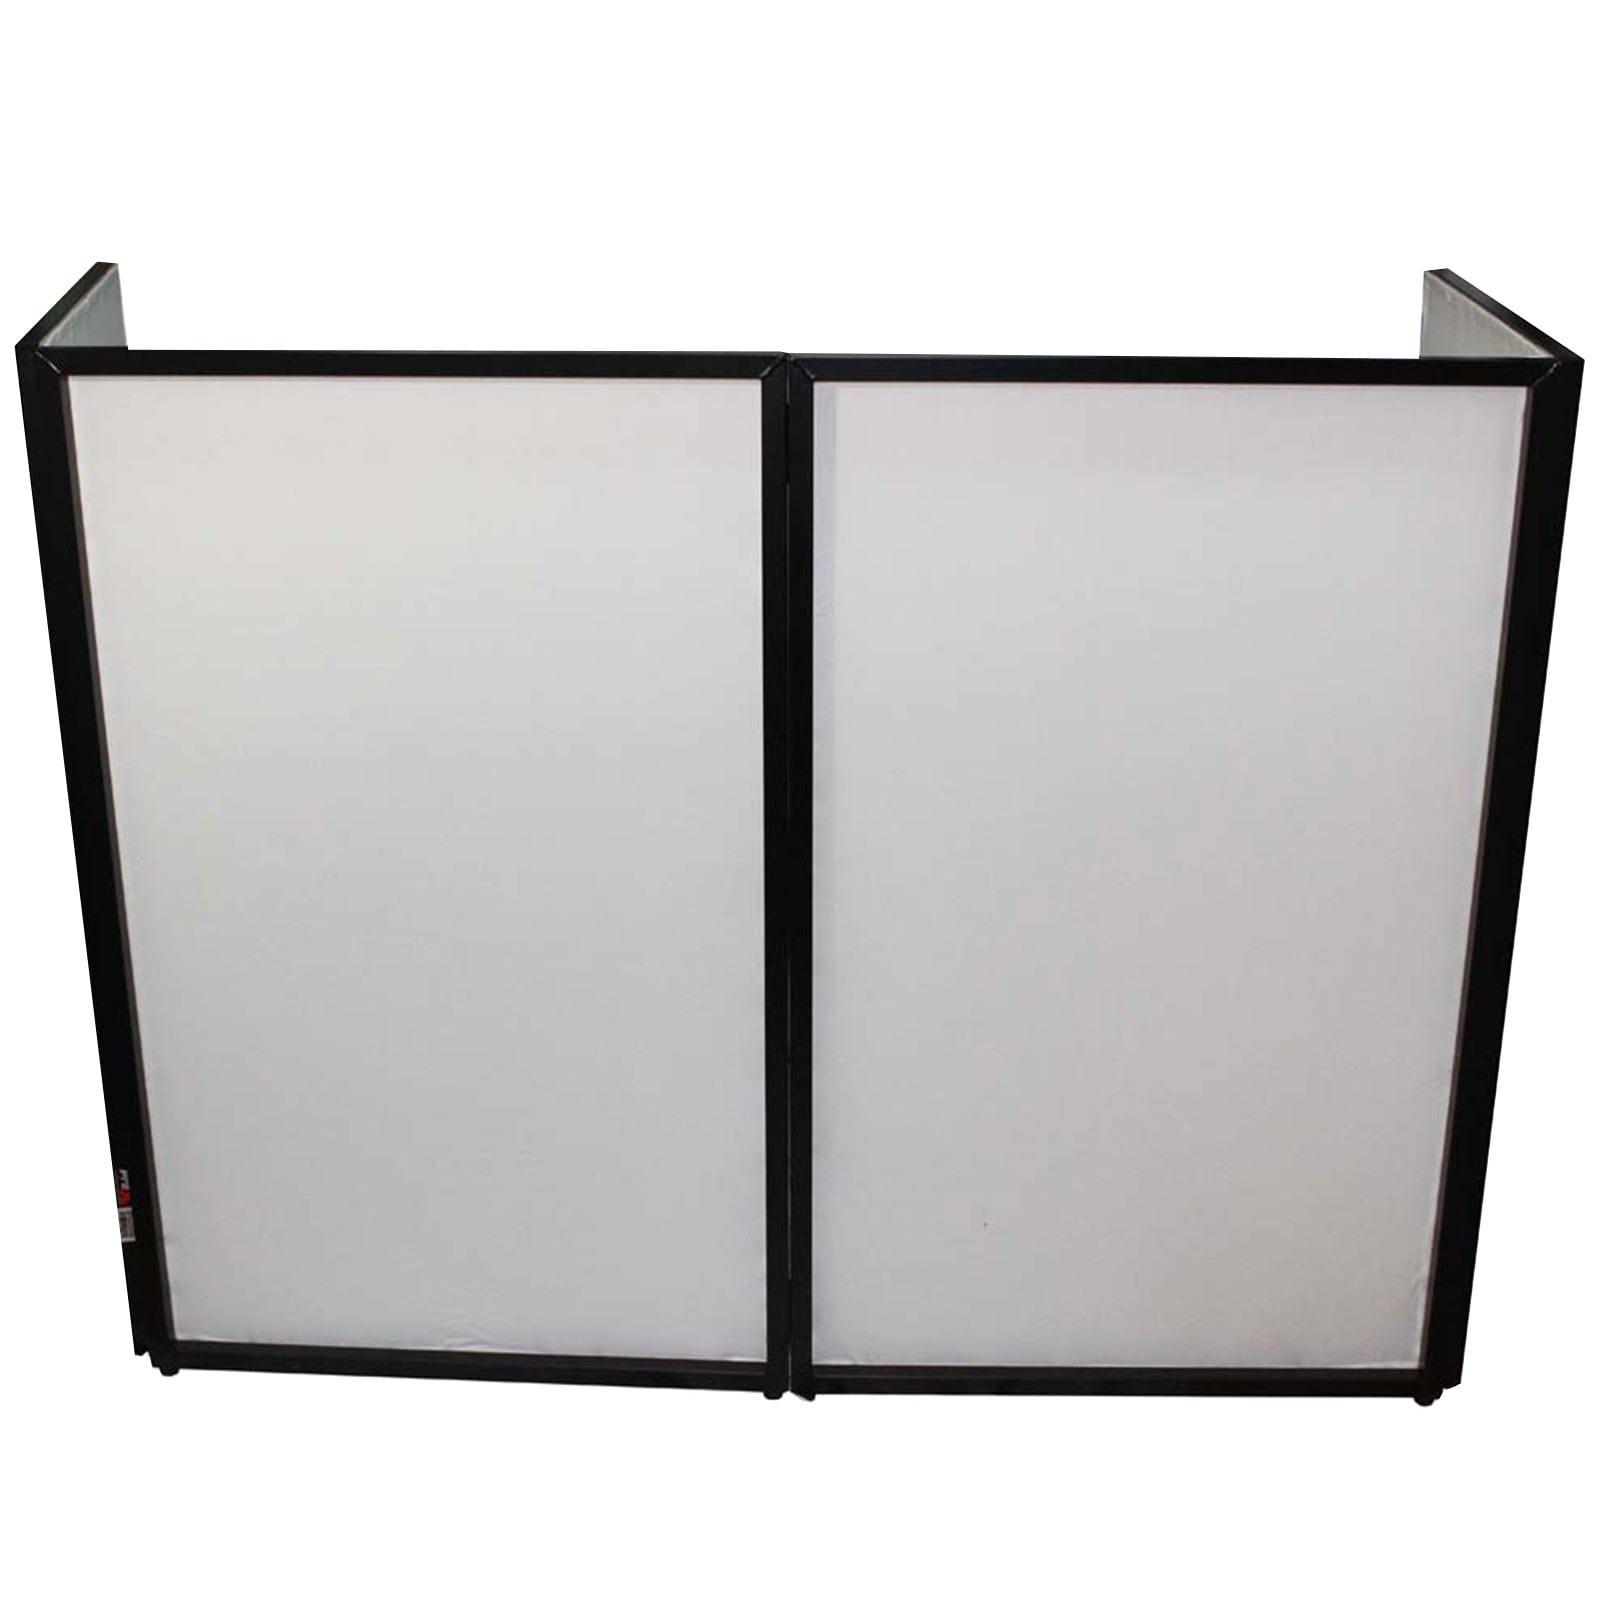 prox-xf-4x3048b-black-aluminum-4-panel-scrim-facade-package-159